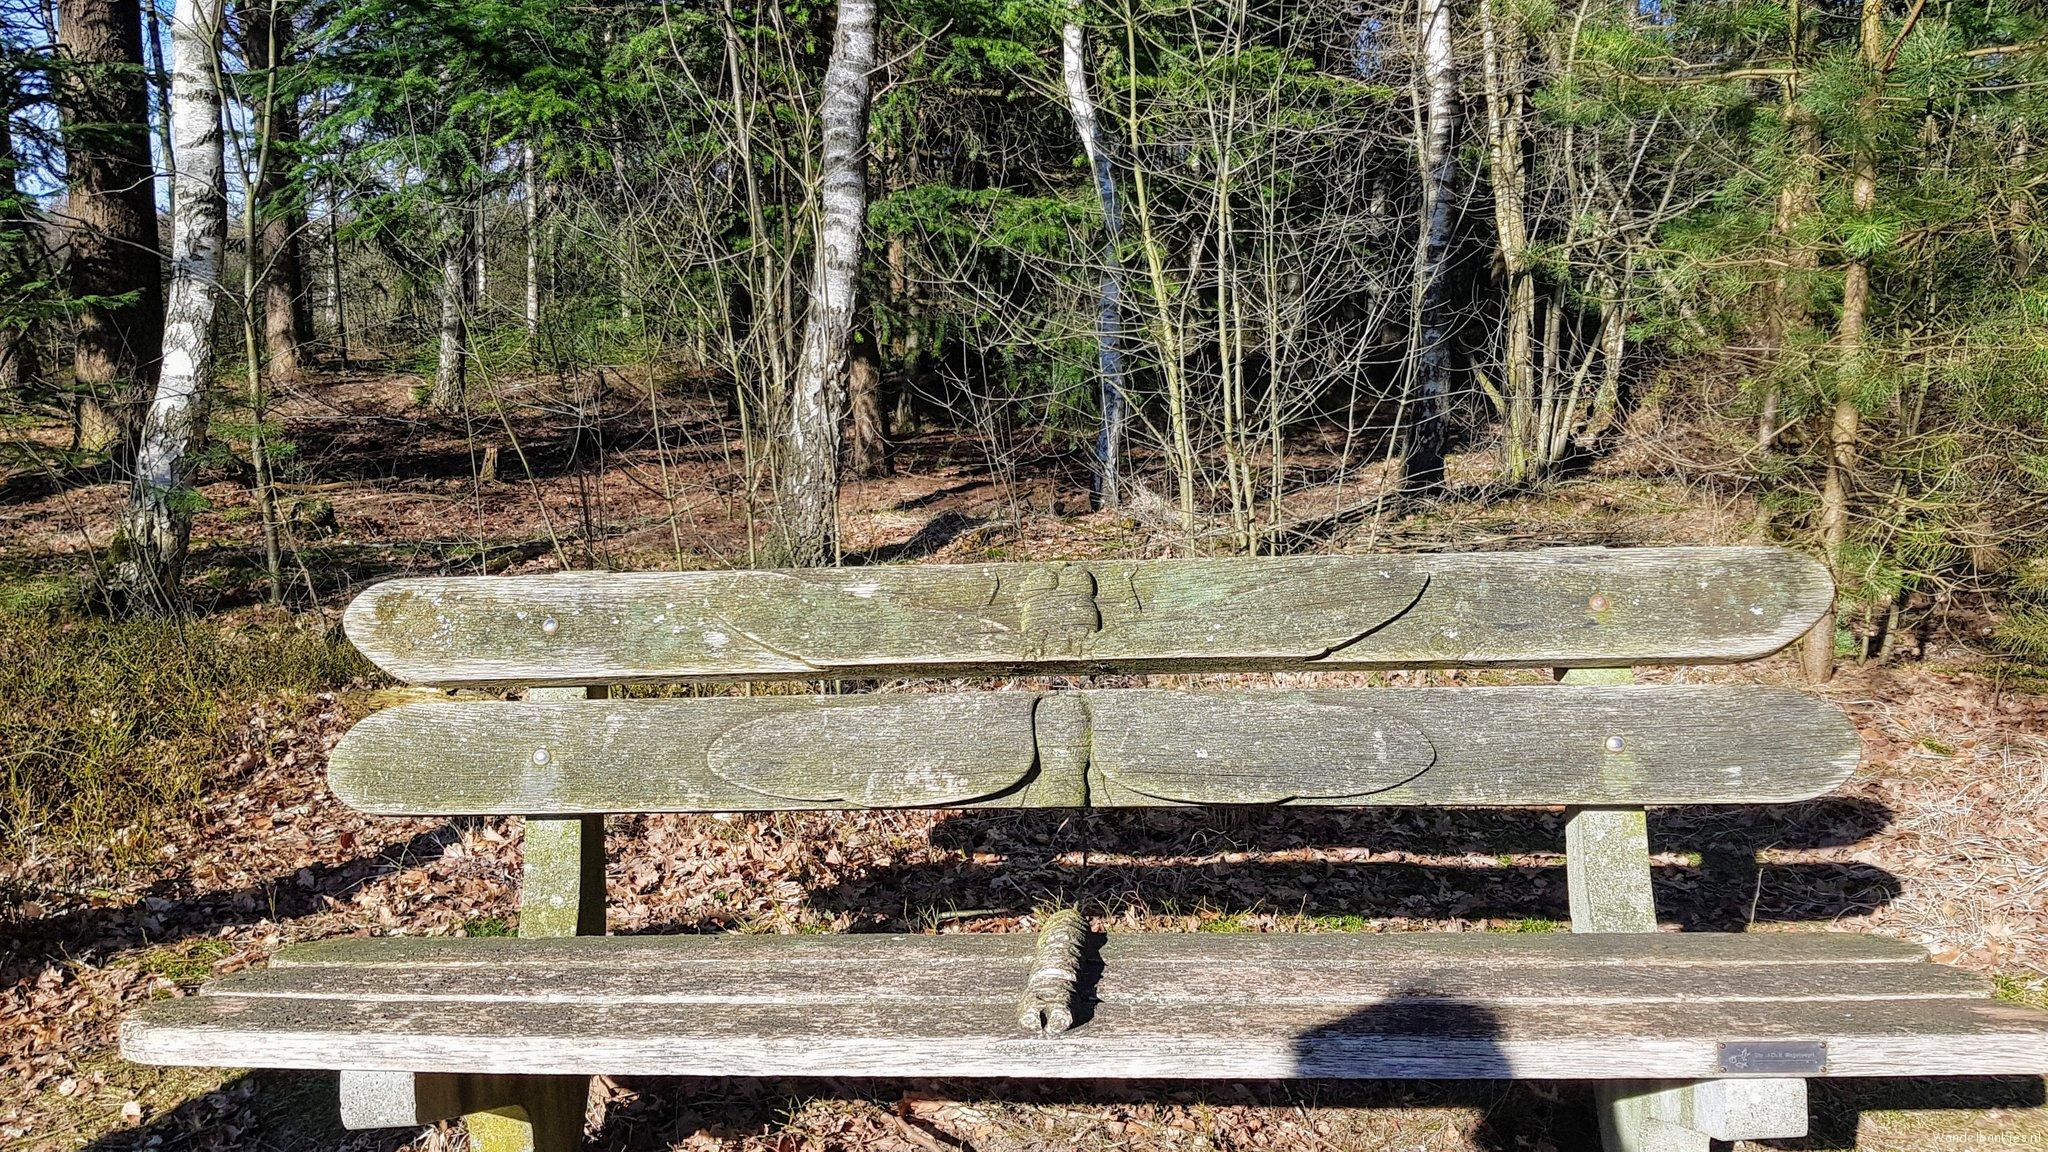 rt-wolfswandelplan-libellebankje-op-landgoed-leusveld-wandelbankjes-brummen-https-t-co-djhrsev0j8